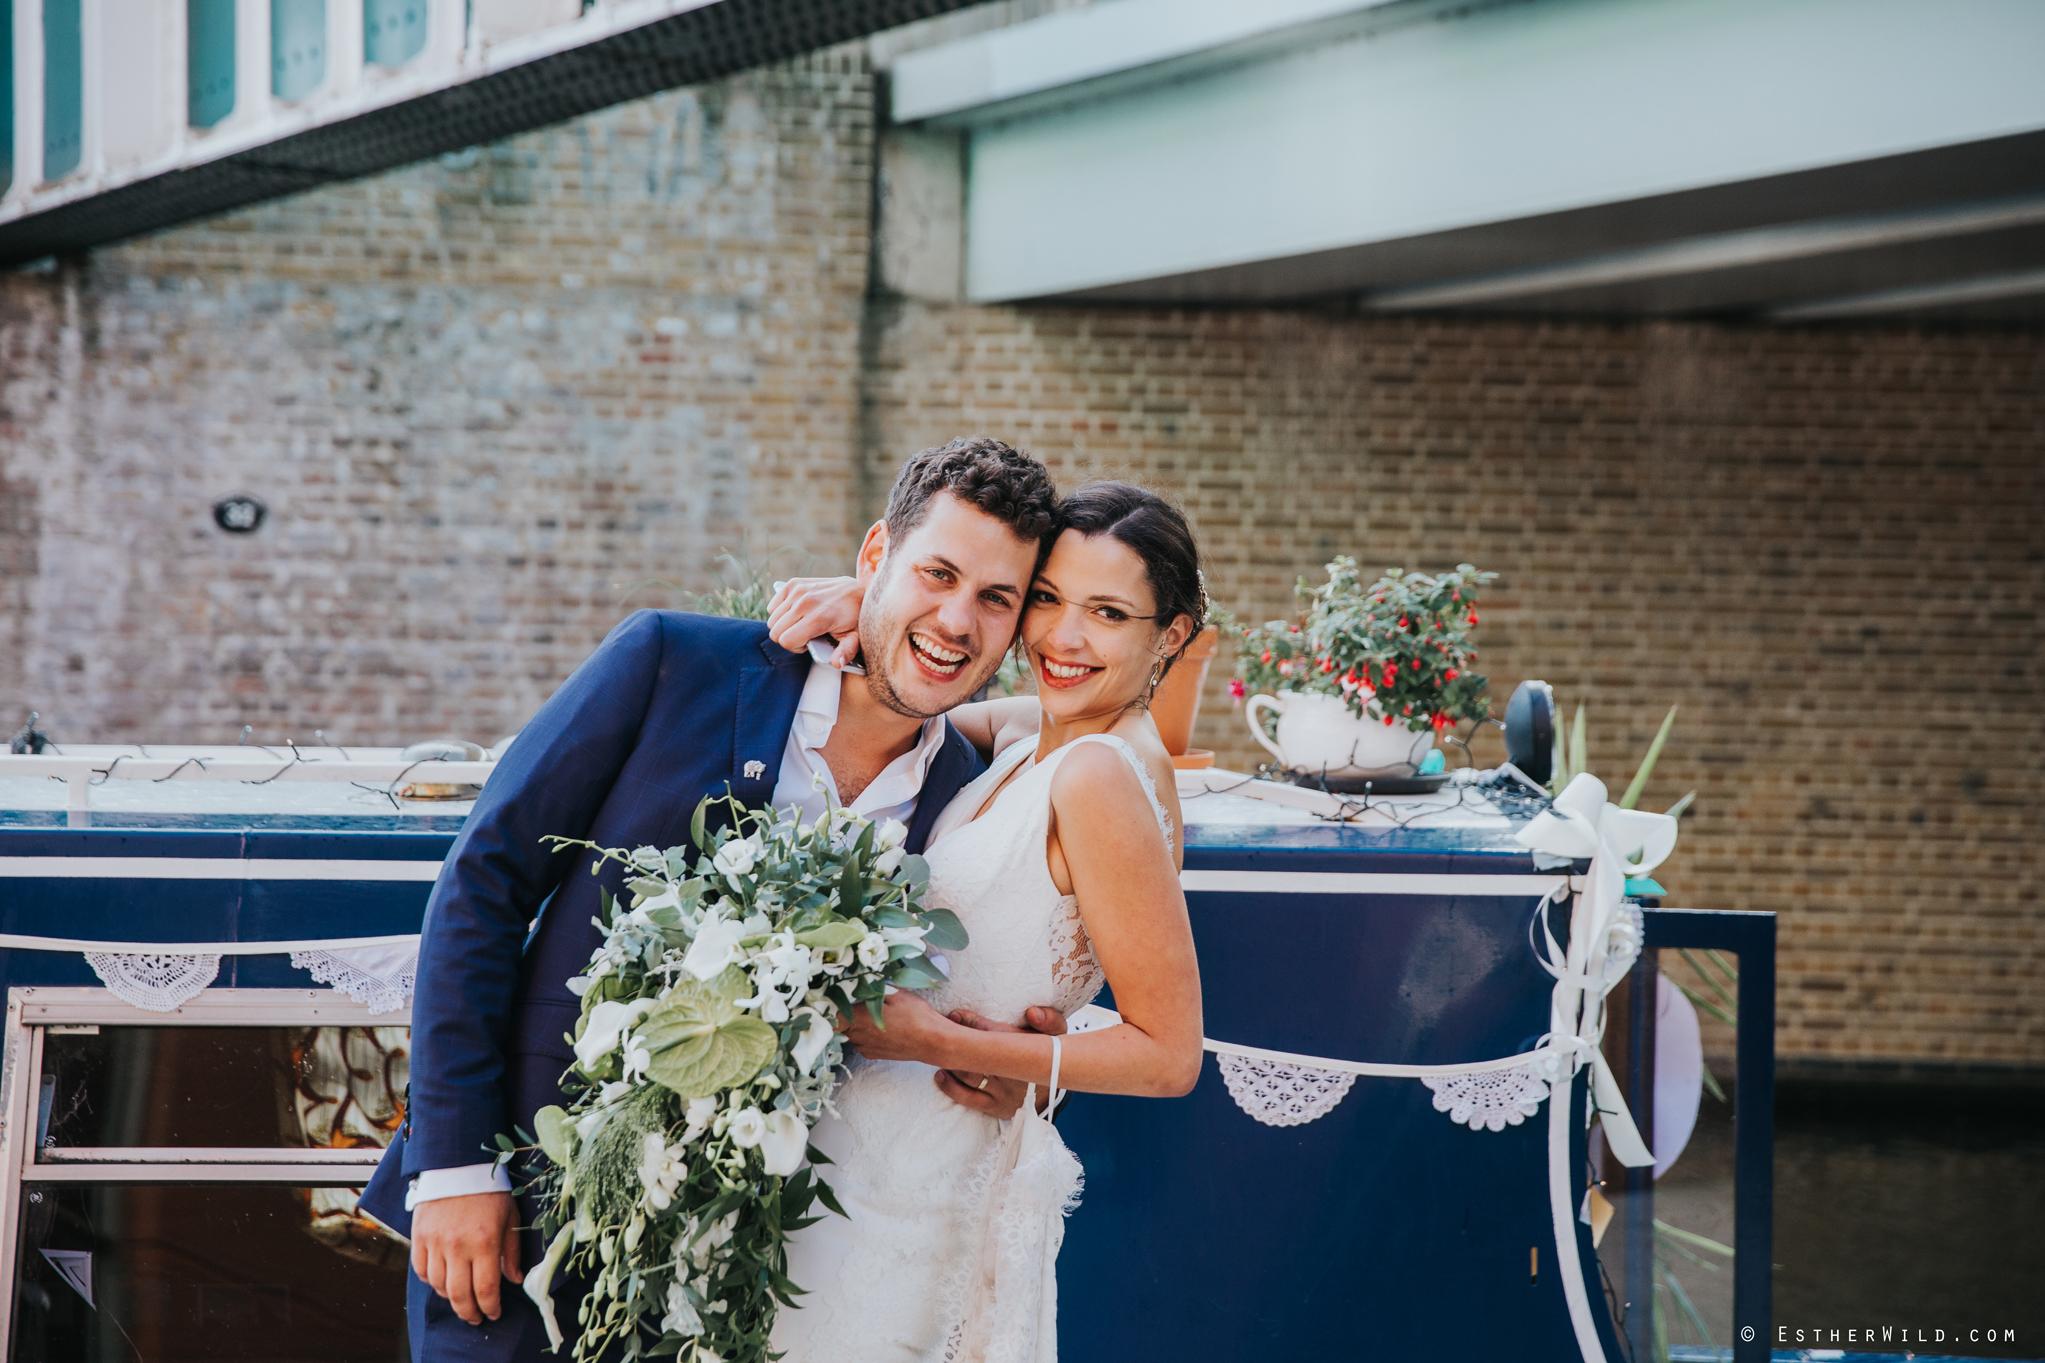 Islington_Town_Hall_Wedding_London_Photographer_Esther_Wild_IMG_6723.jpg